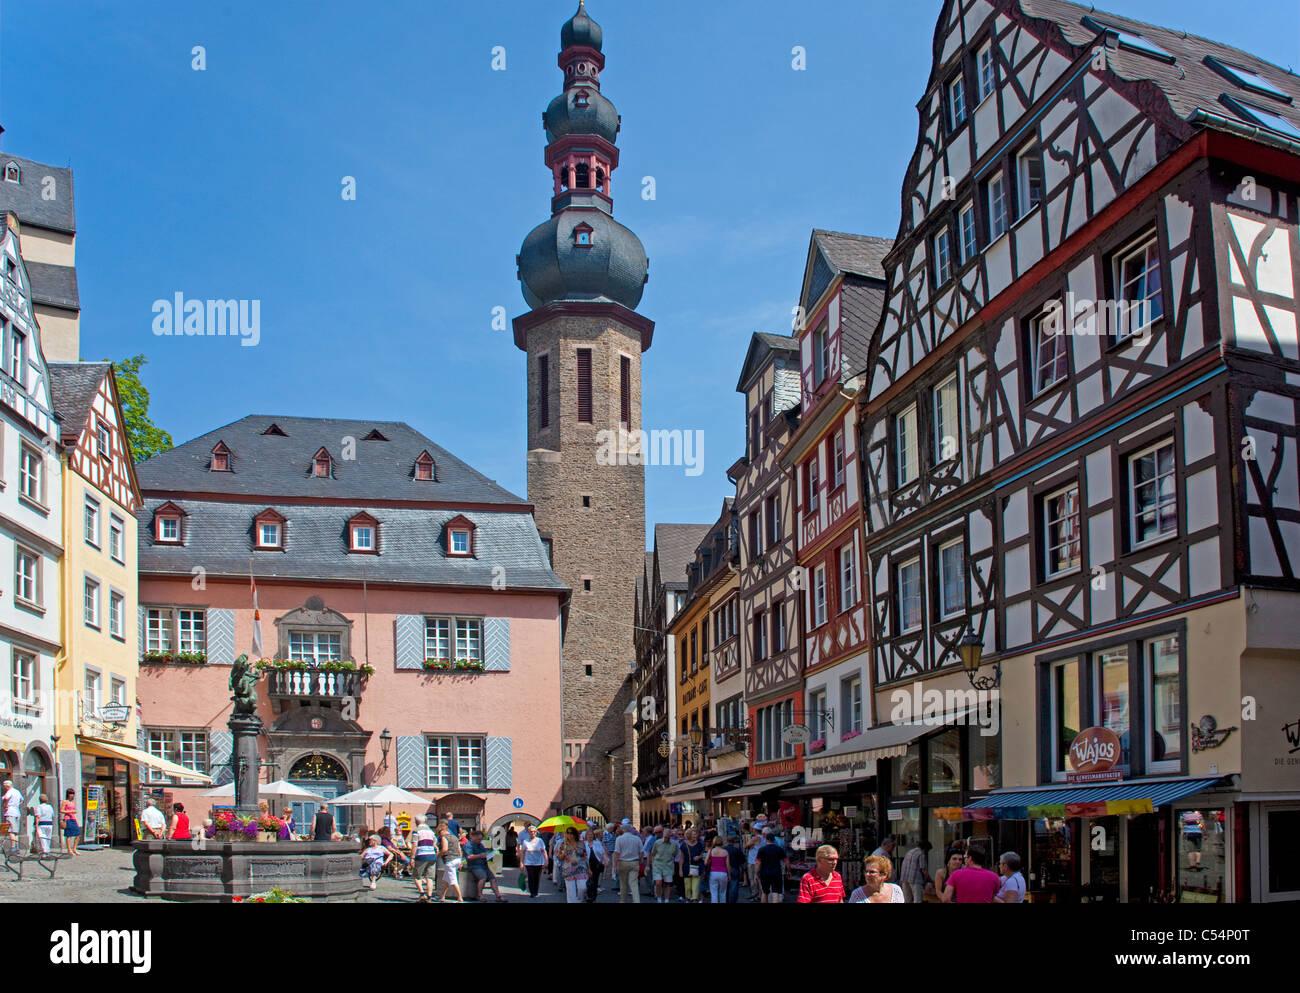 Marktplatz Mit Historischem Brunnen, Sankt Martin Kirche, Marktplatz, Brunnen, Kirche Saint-Martin, Altstadt Stockbild